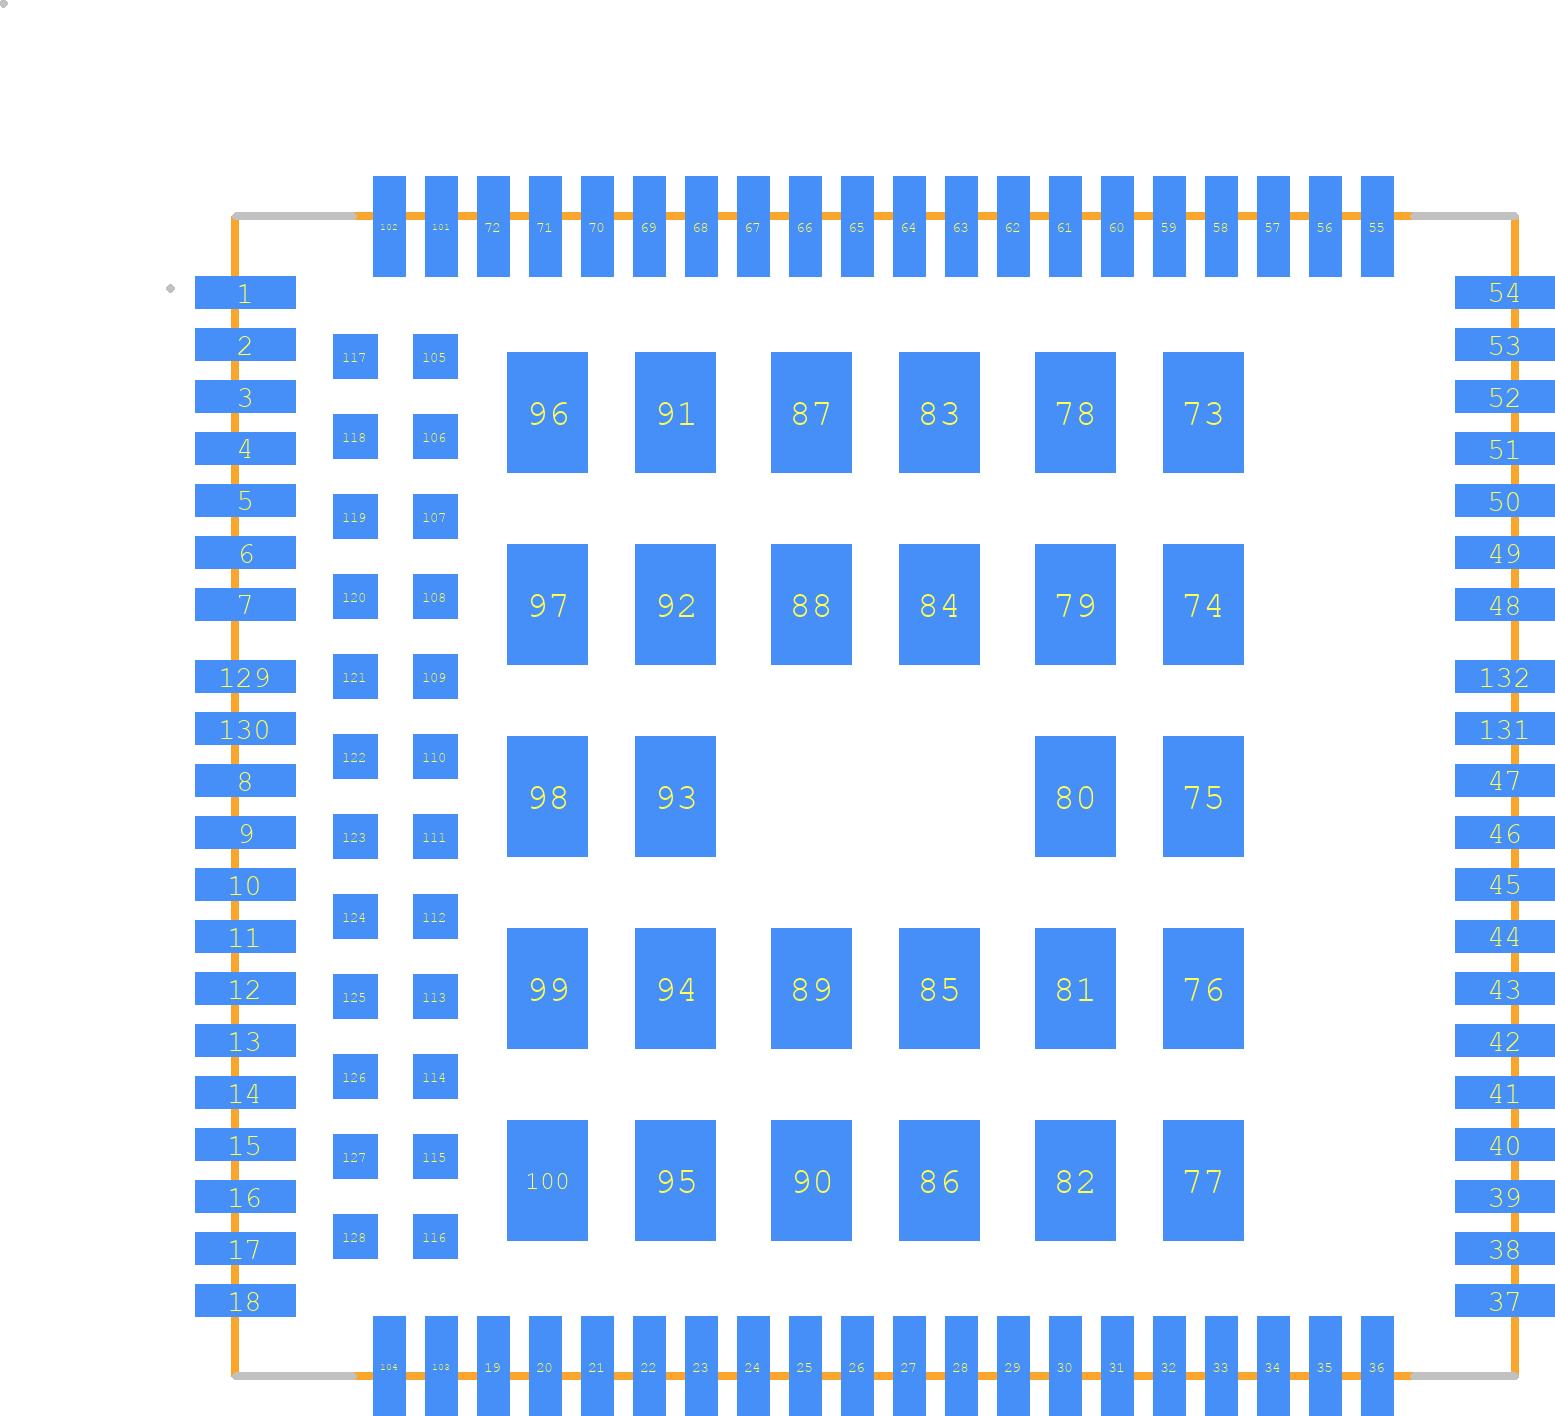 EC25-AU - Quectel PCB footprint - Other - EC25-AU